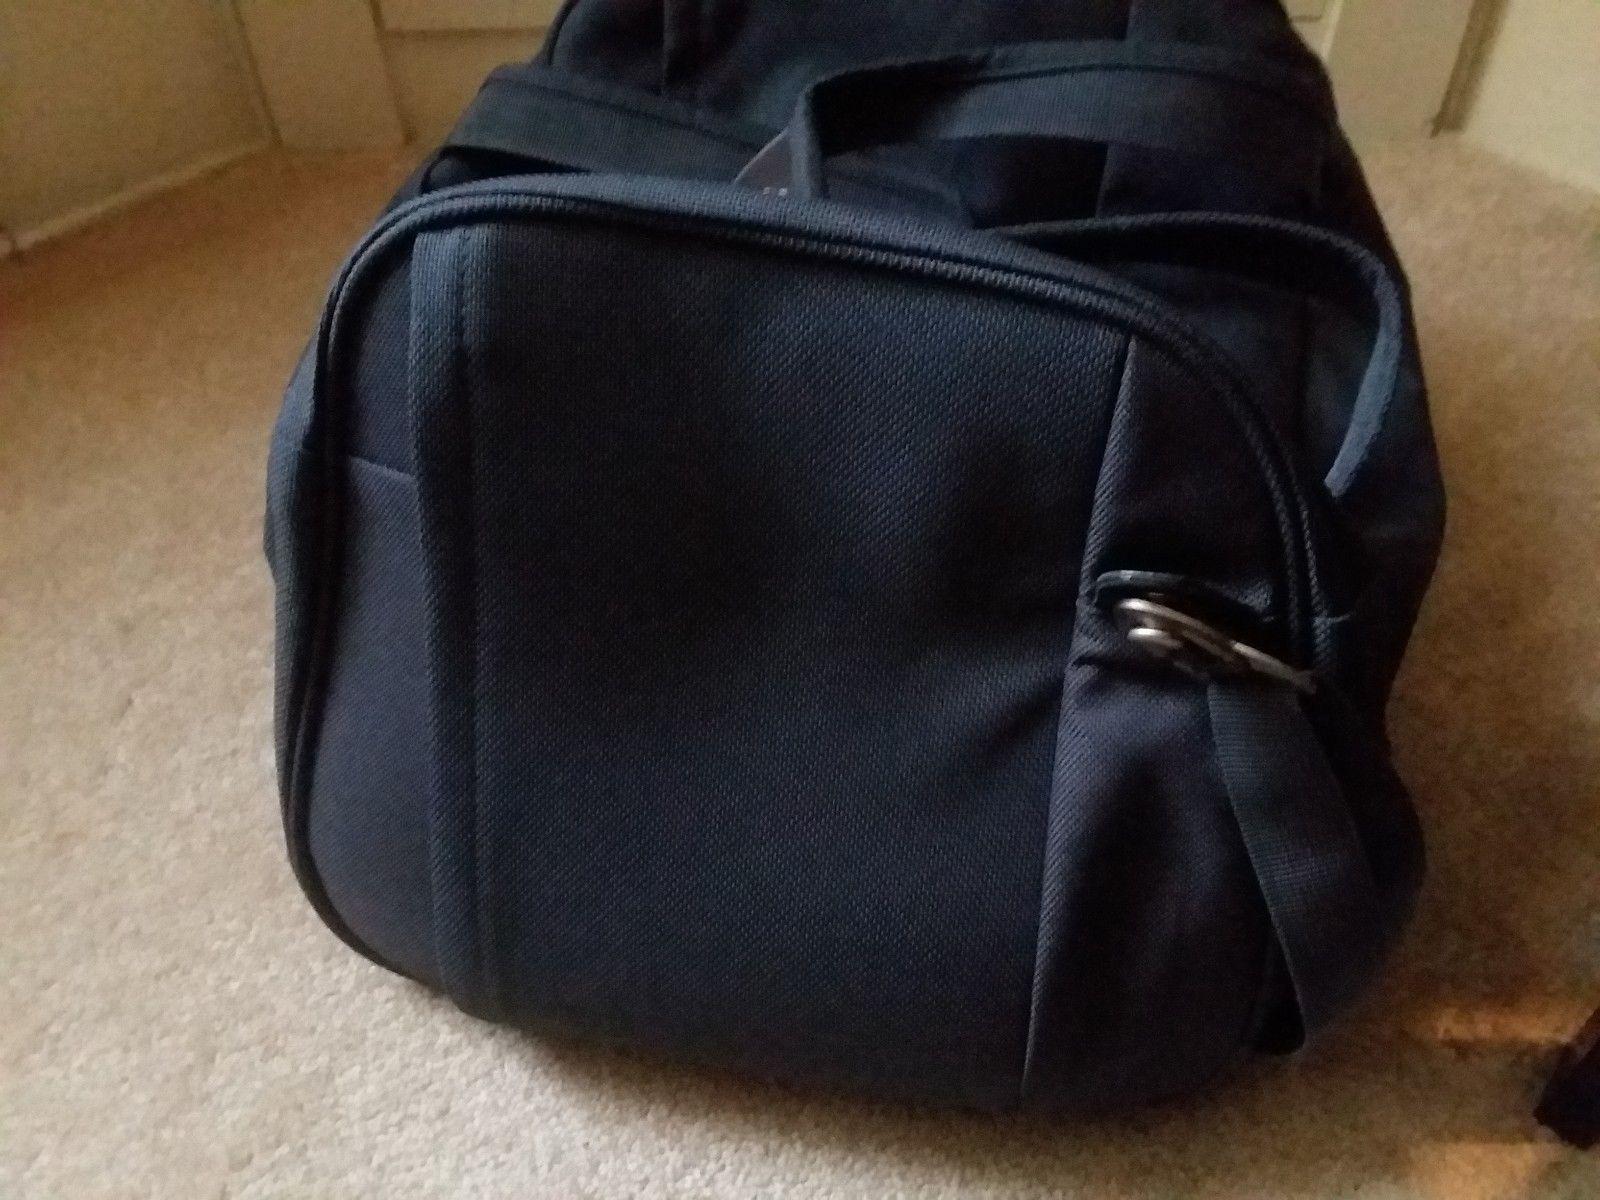 Samsonite Gray Yellow Travel Case Duffel Luggage image 3